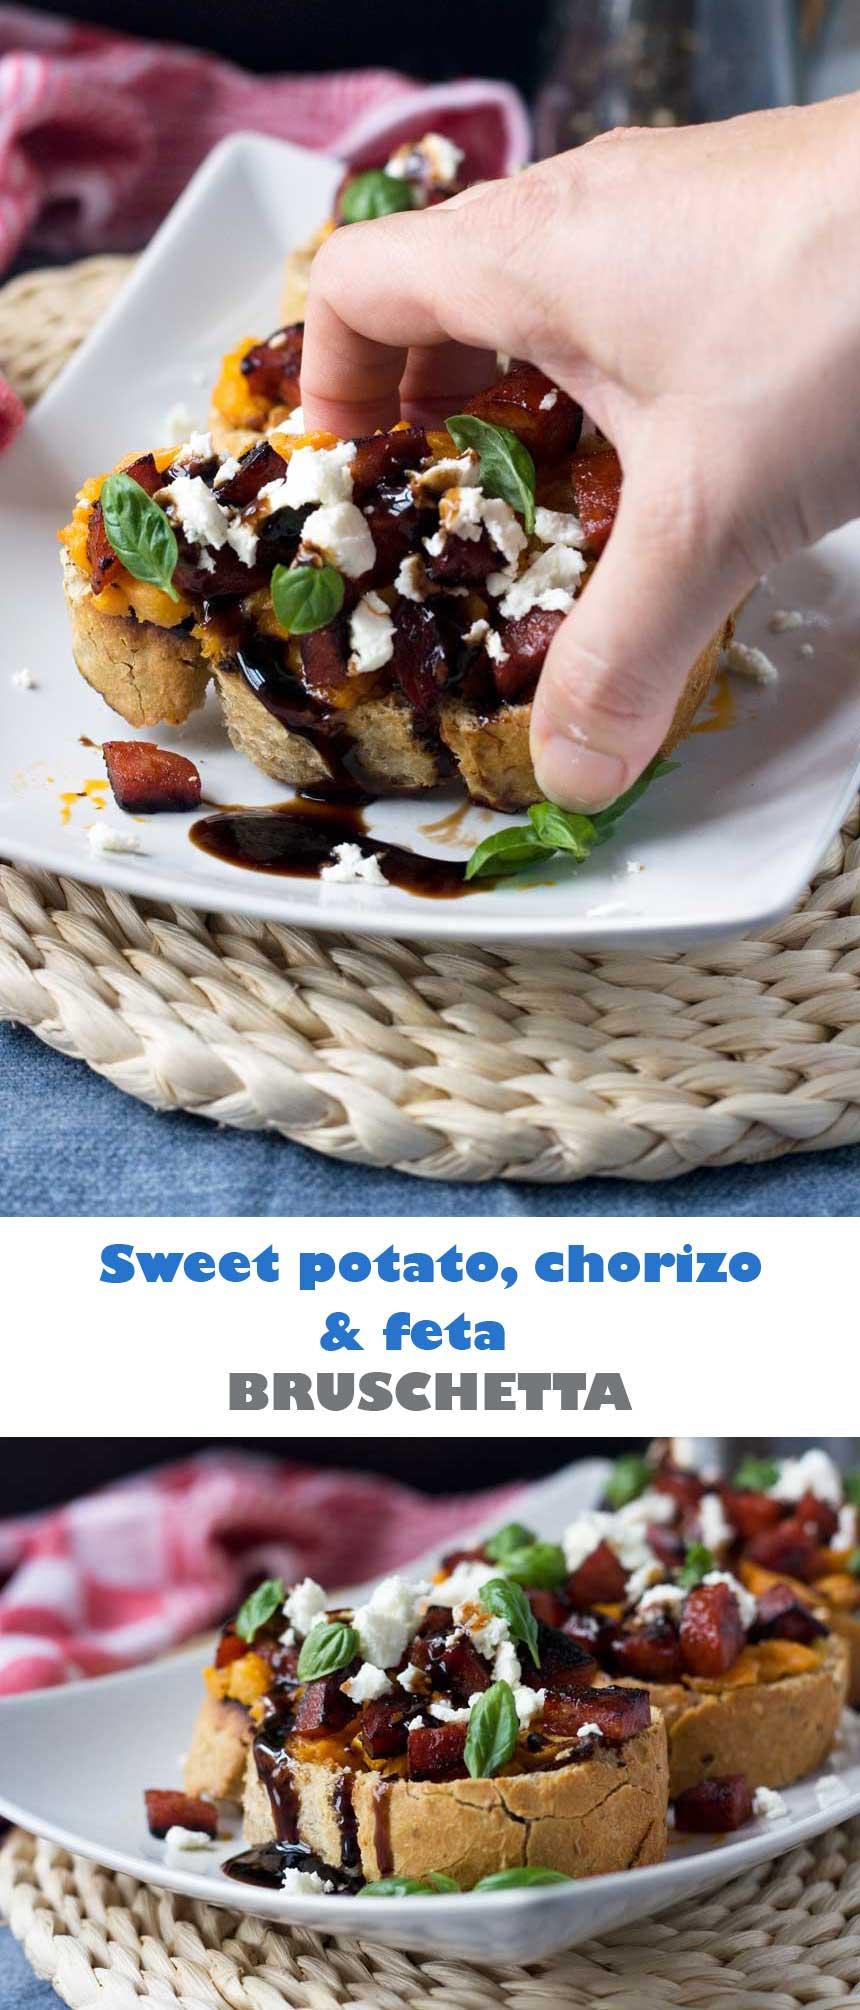 Sweet potato, chorizo and feta bruschetta